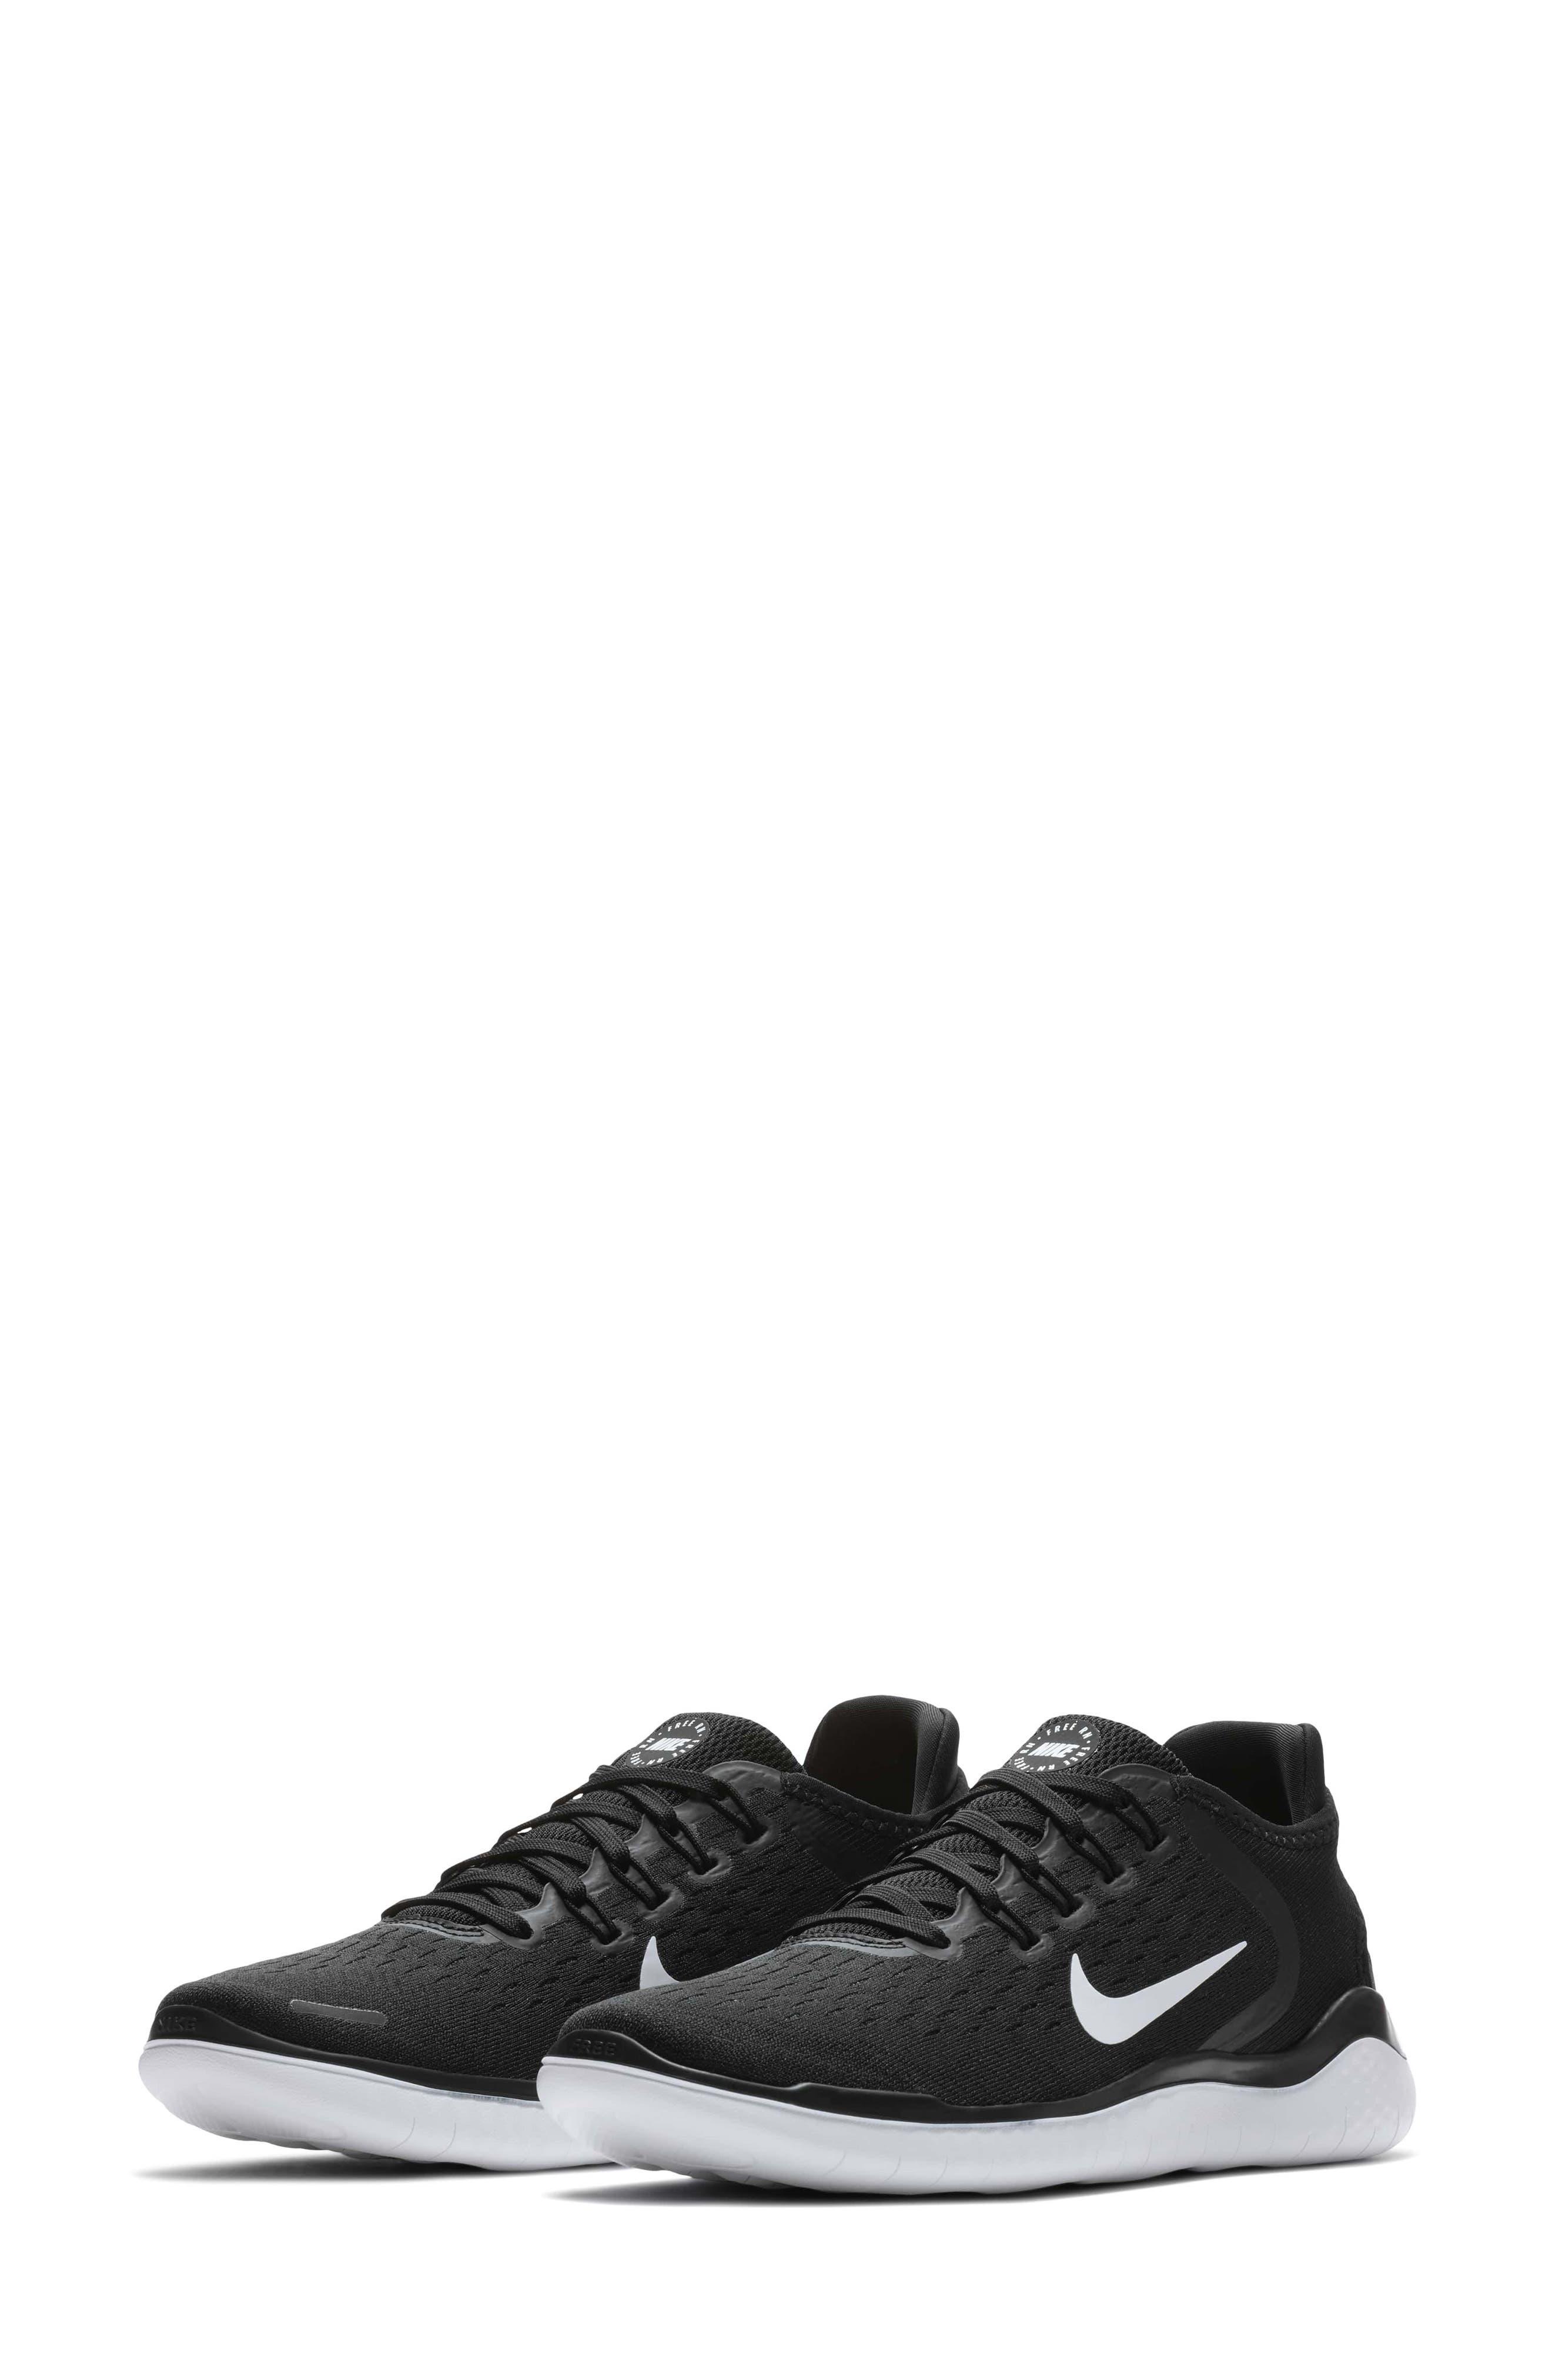 NIKE,                             Free RN 2018 Running Shoe,                             Main thumbnail 1, color,                             BLACK/ WHITE